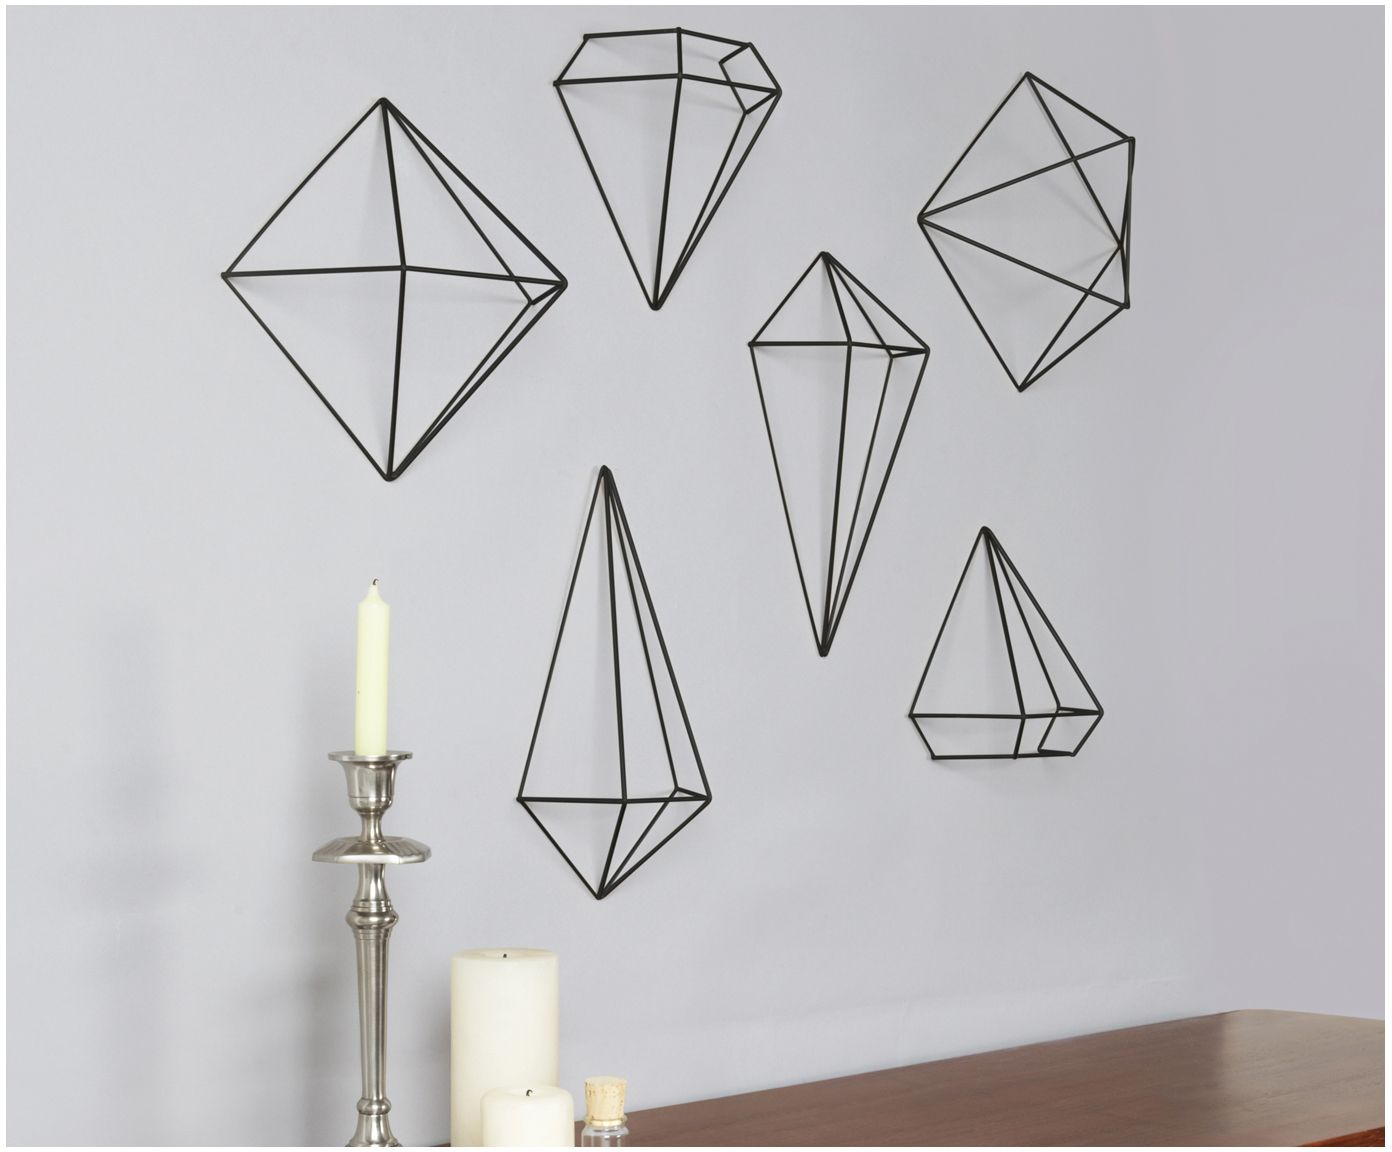 AFFILIATELINK | Wand Objekte Set Prisma, 6 Tlg., Skandinavisch,